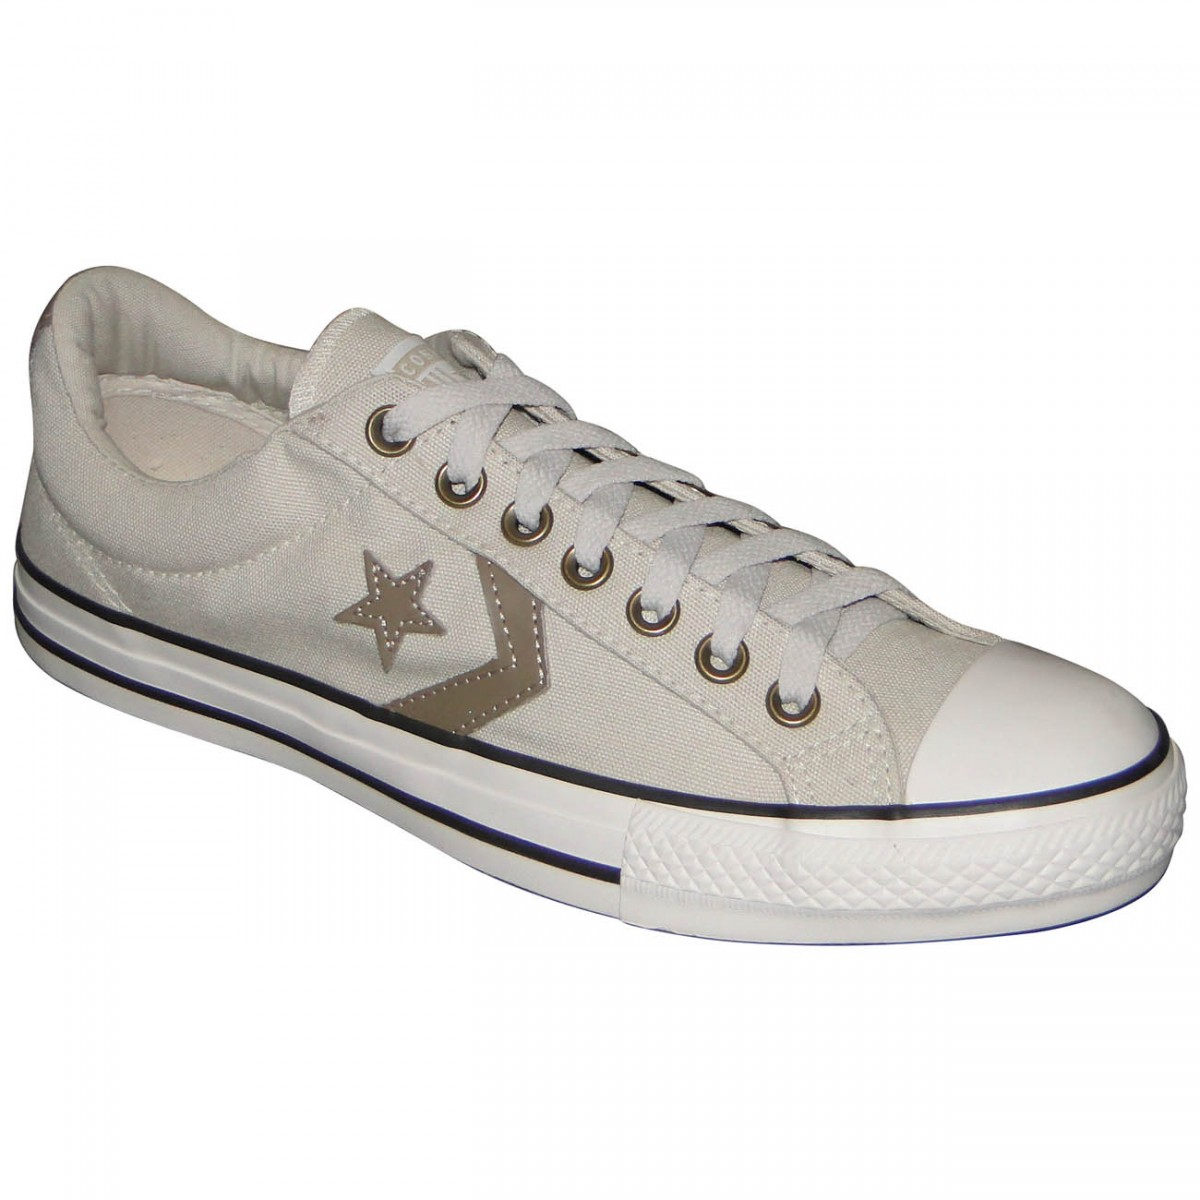 829f22c6e8b TENIS ALL STAR CONVERSE STAR PLAYER CO055693BEGCAQ - BEGE CAQUI - Chuteira  Nike